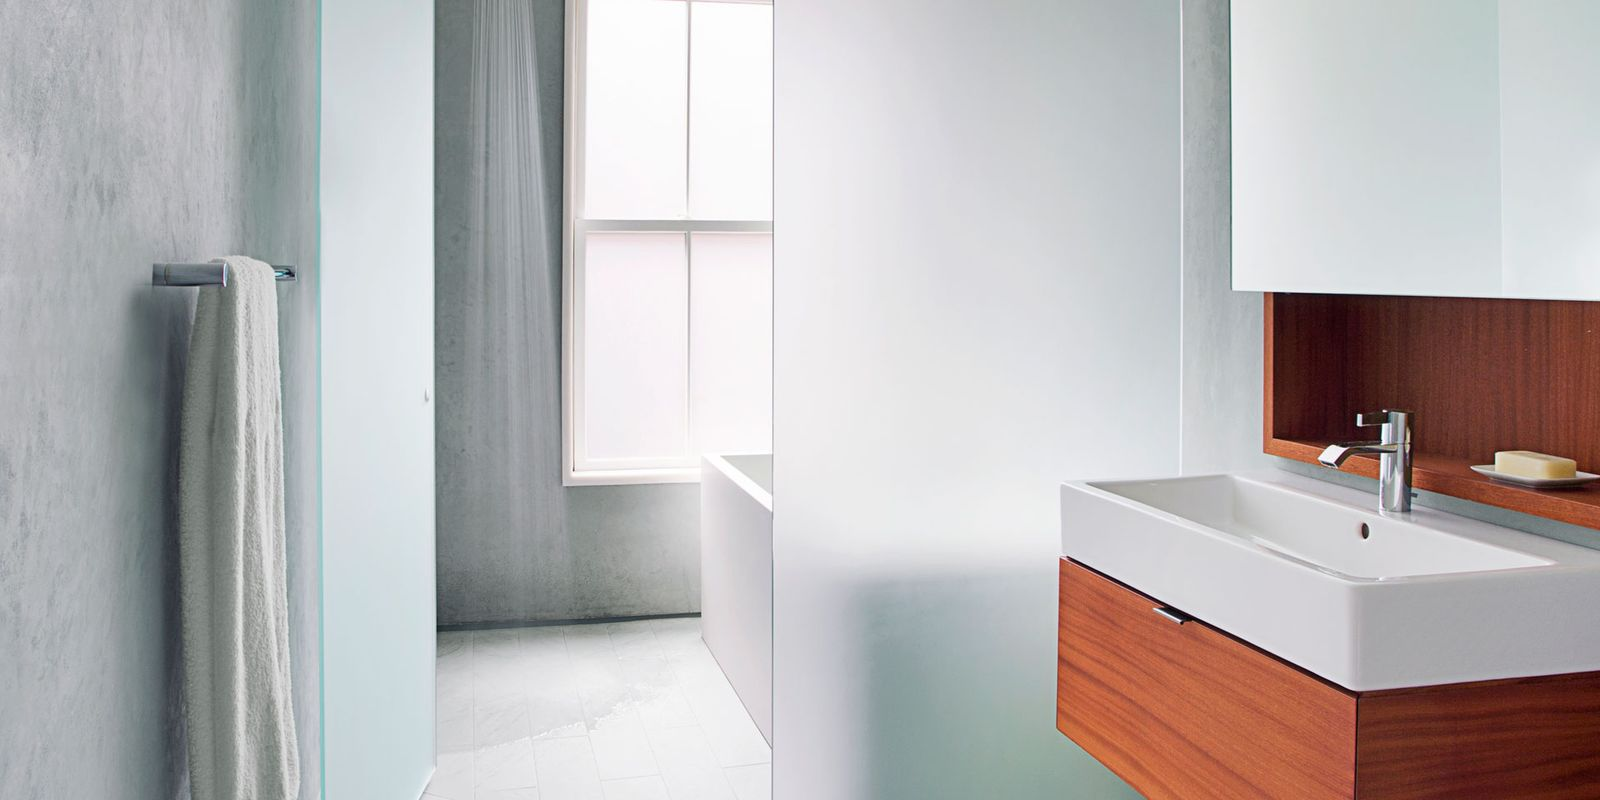 Modern and ethereal bathroom calming bathroom decor ideas for Calming bathroom ideas